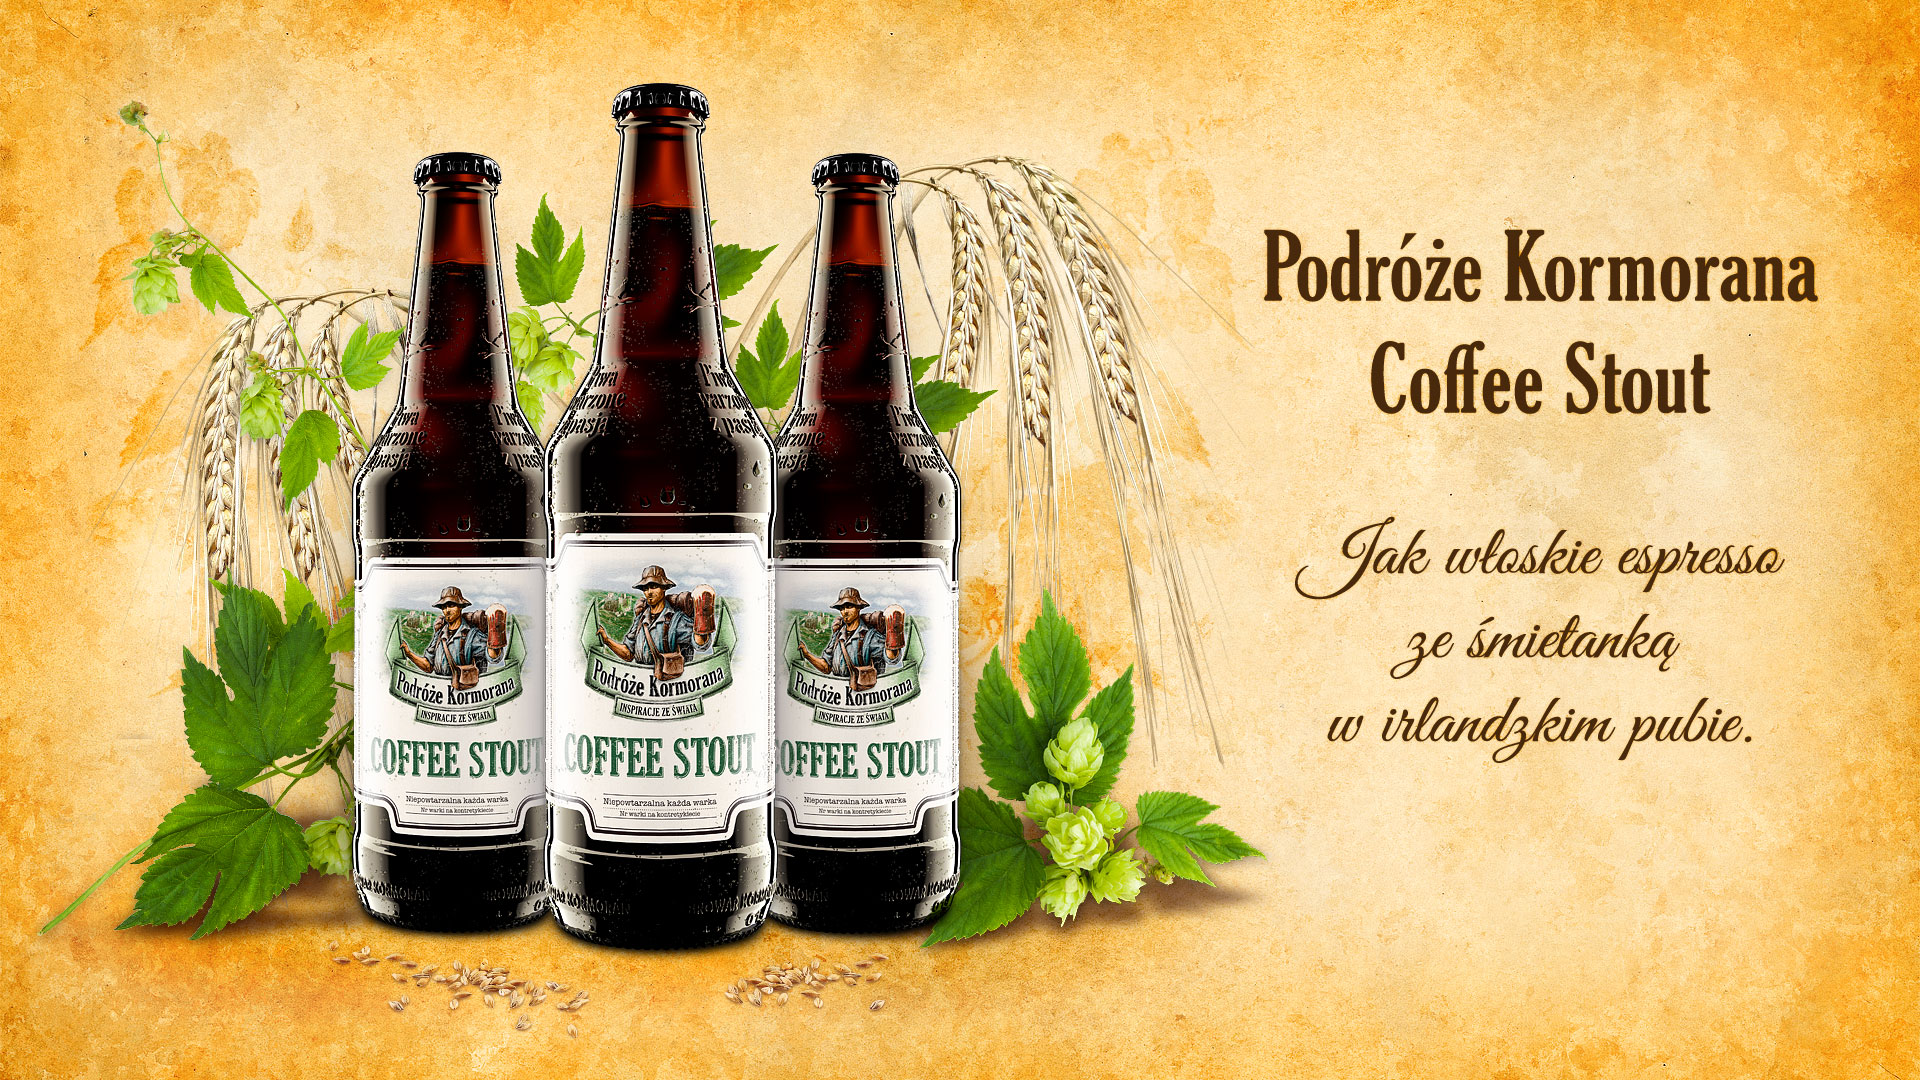 Piwo Podróże Kormorana Coffee Stout - Browar Kormoran